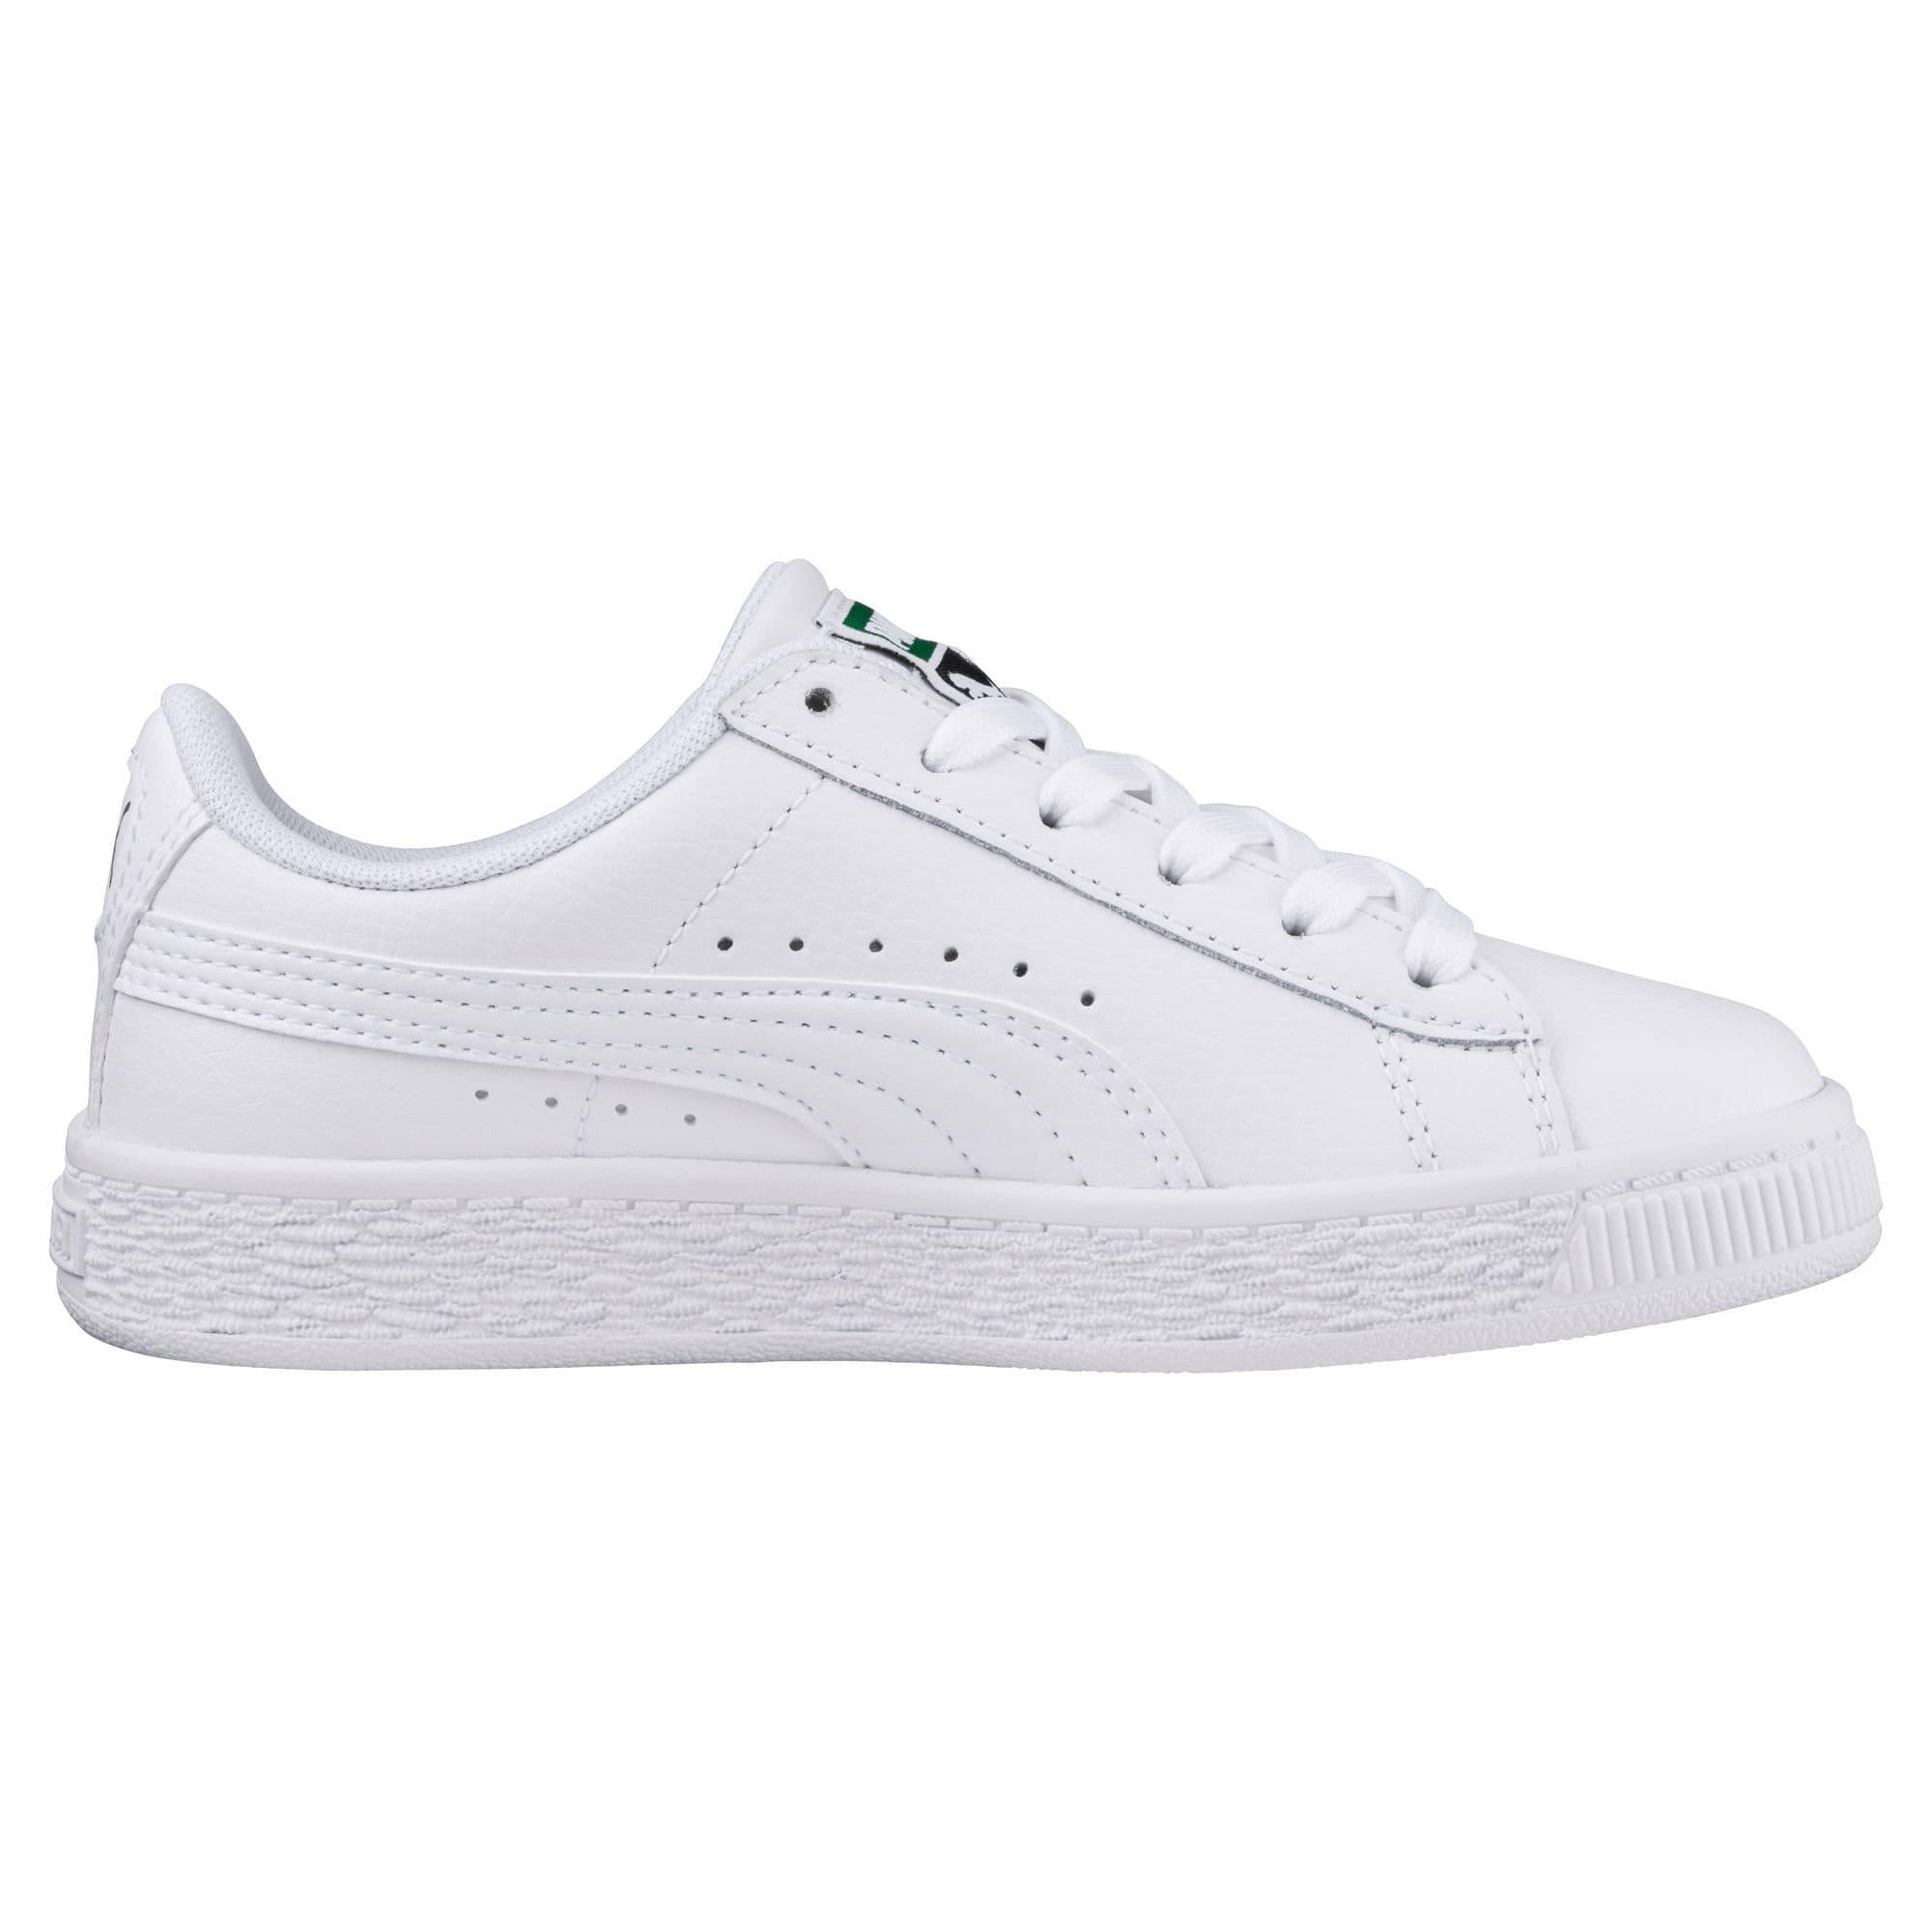 Thumbnail 4 of Basket Classic Sneakers JR, Puma White-Puma White, medium